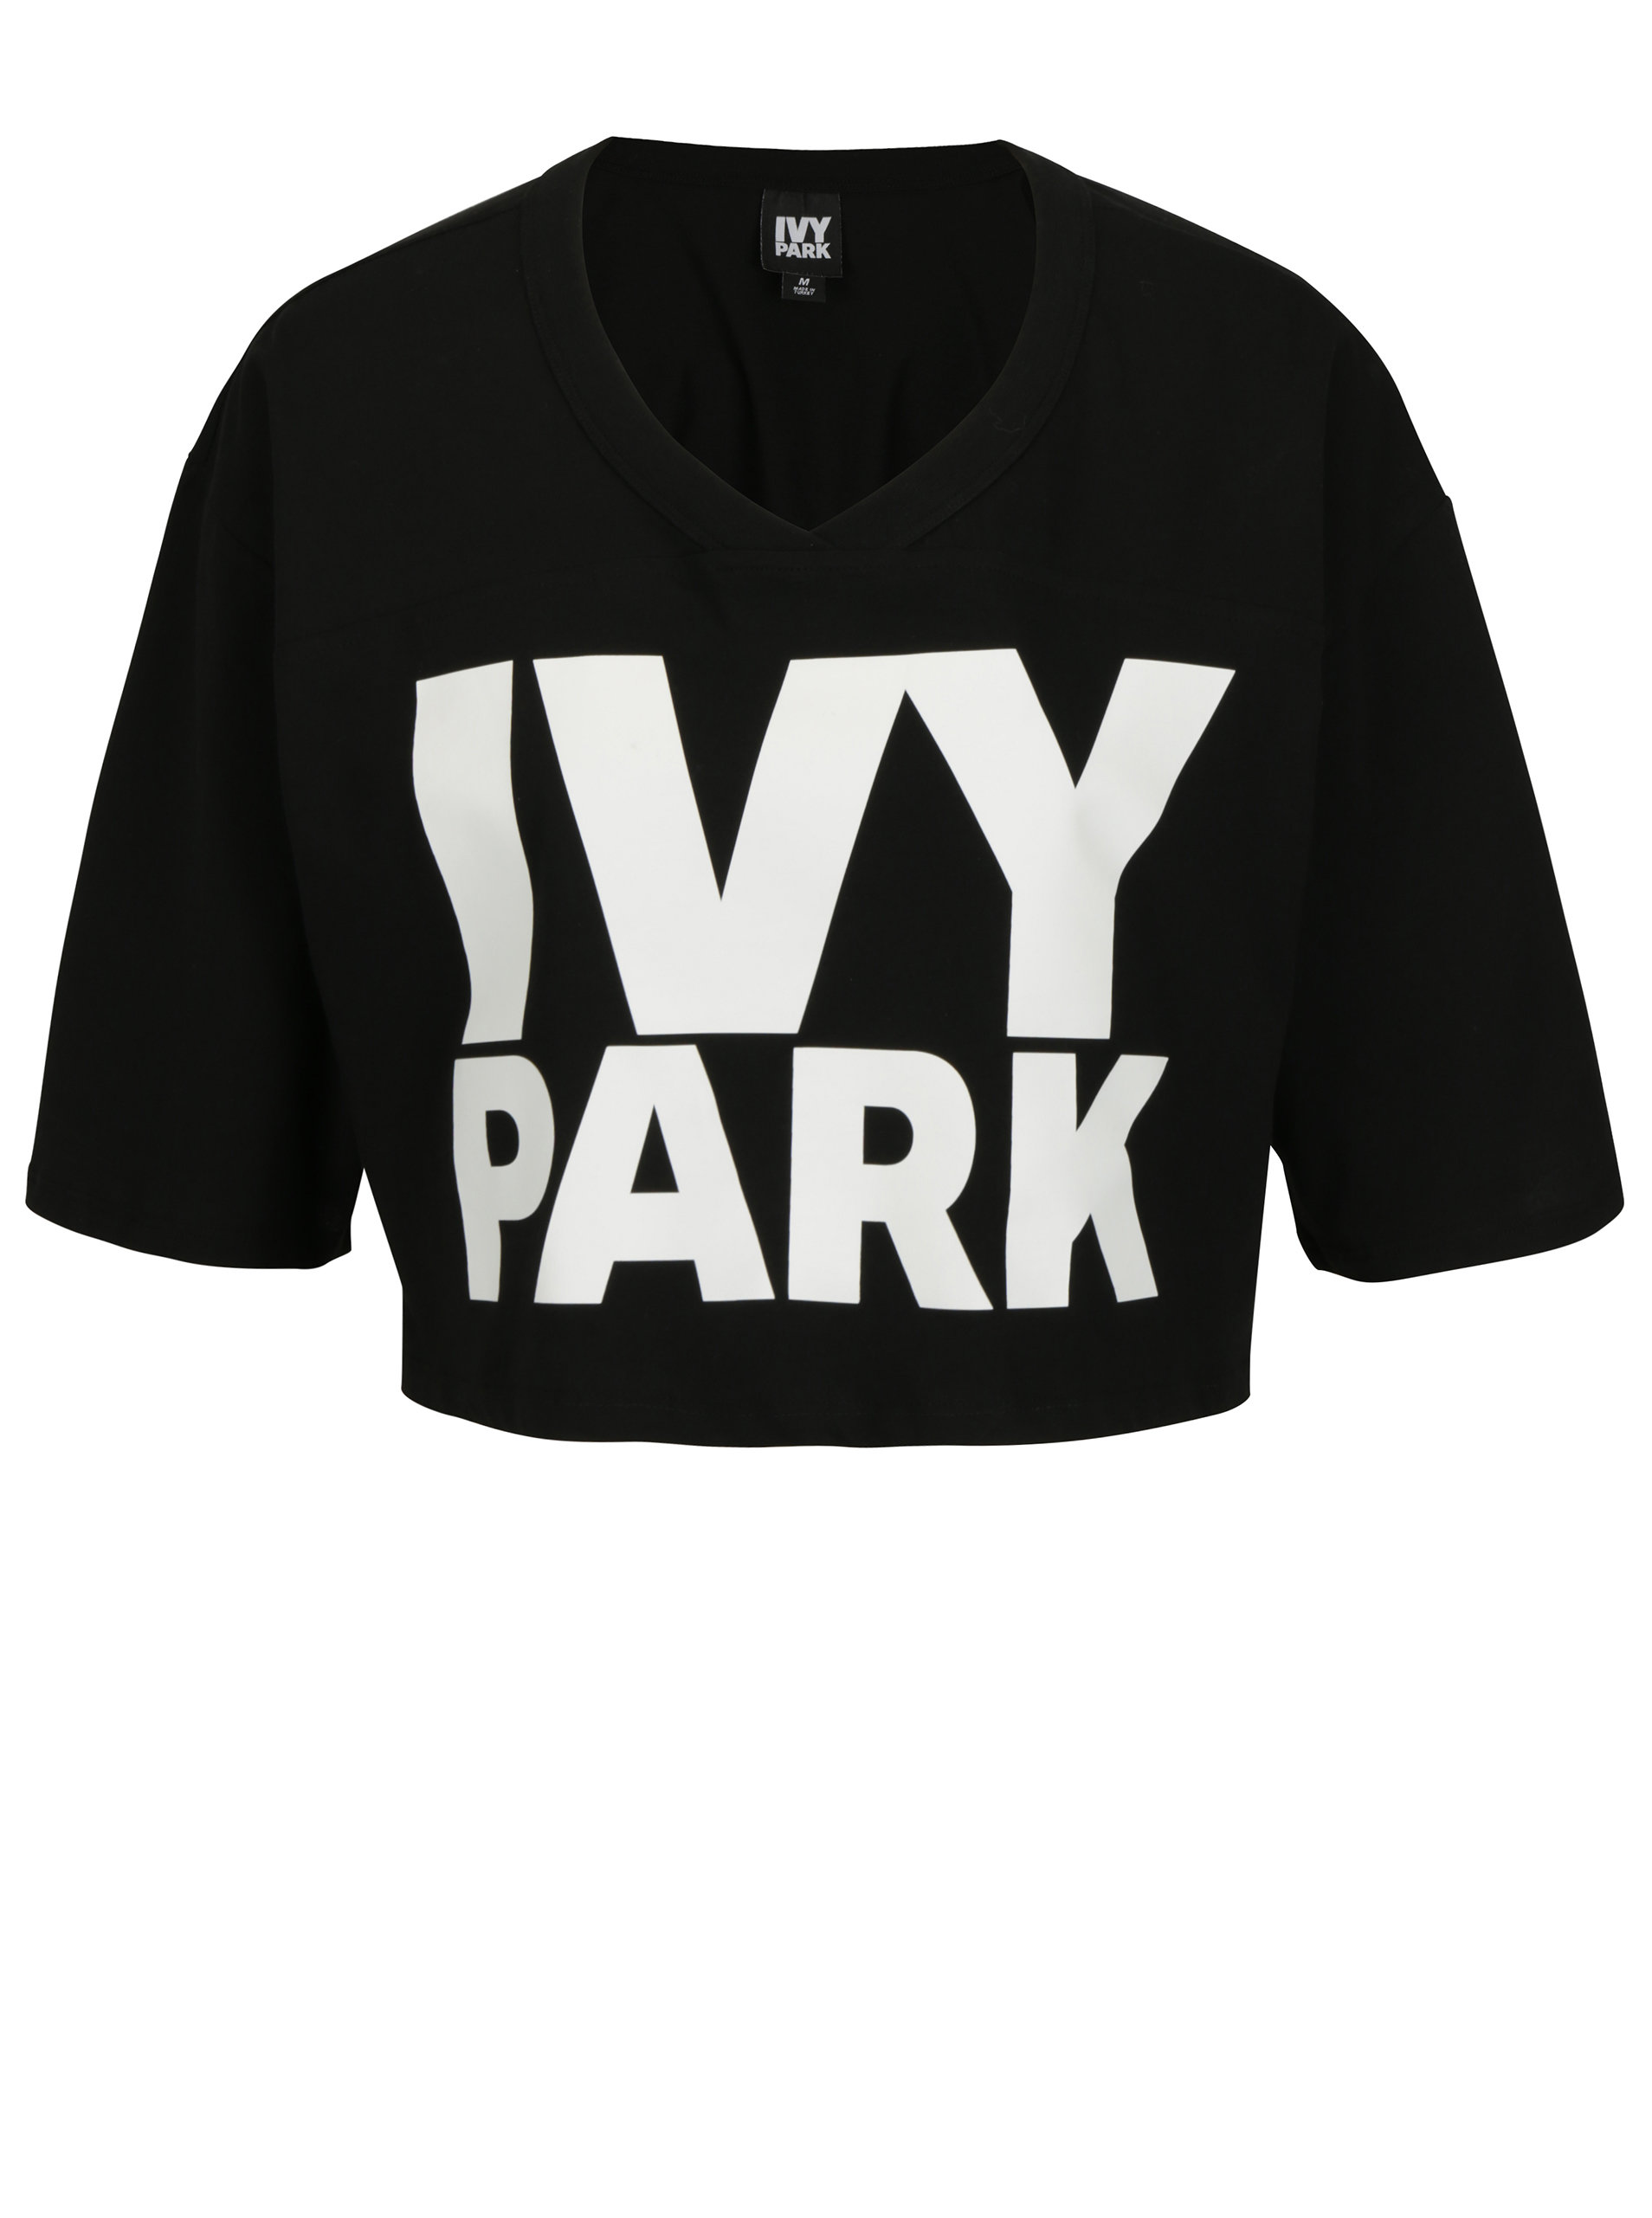 3c13f1bc874 Černý crop top s potiskem Ivy Park ...